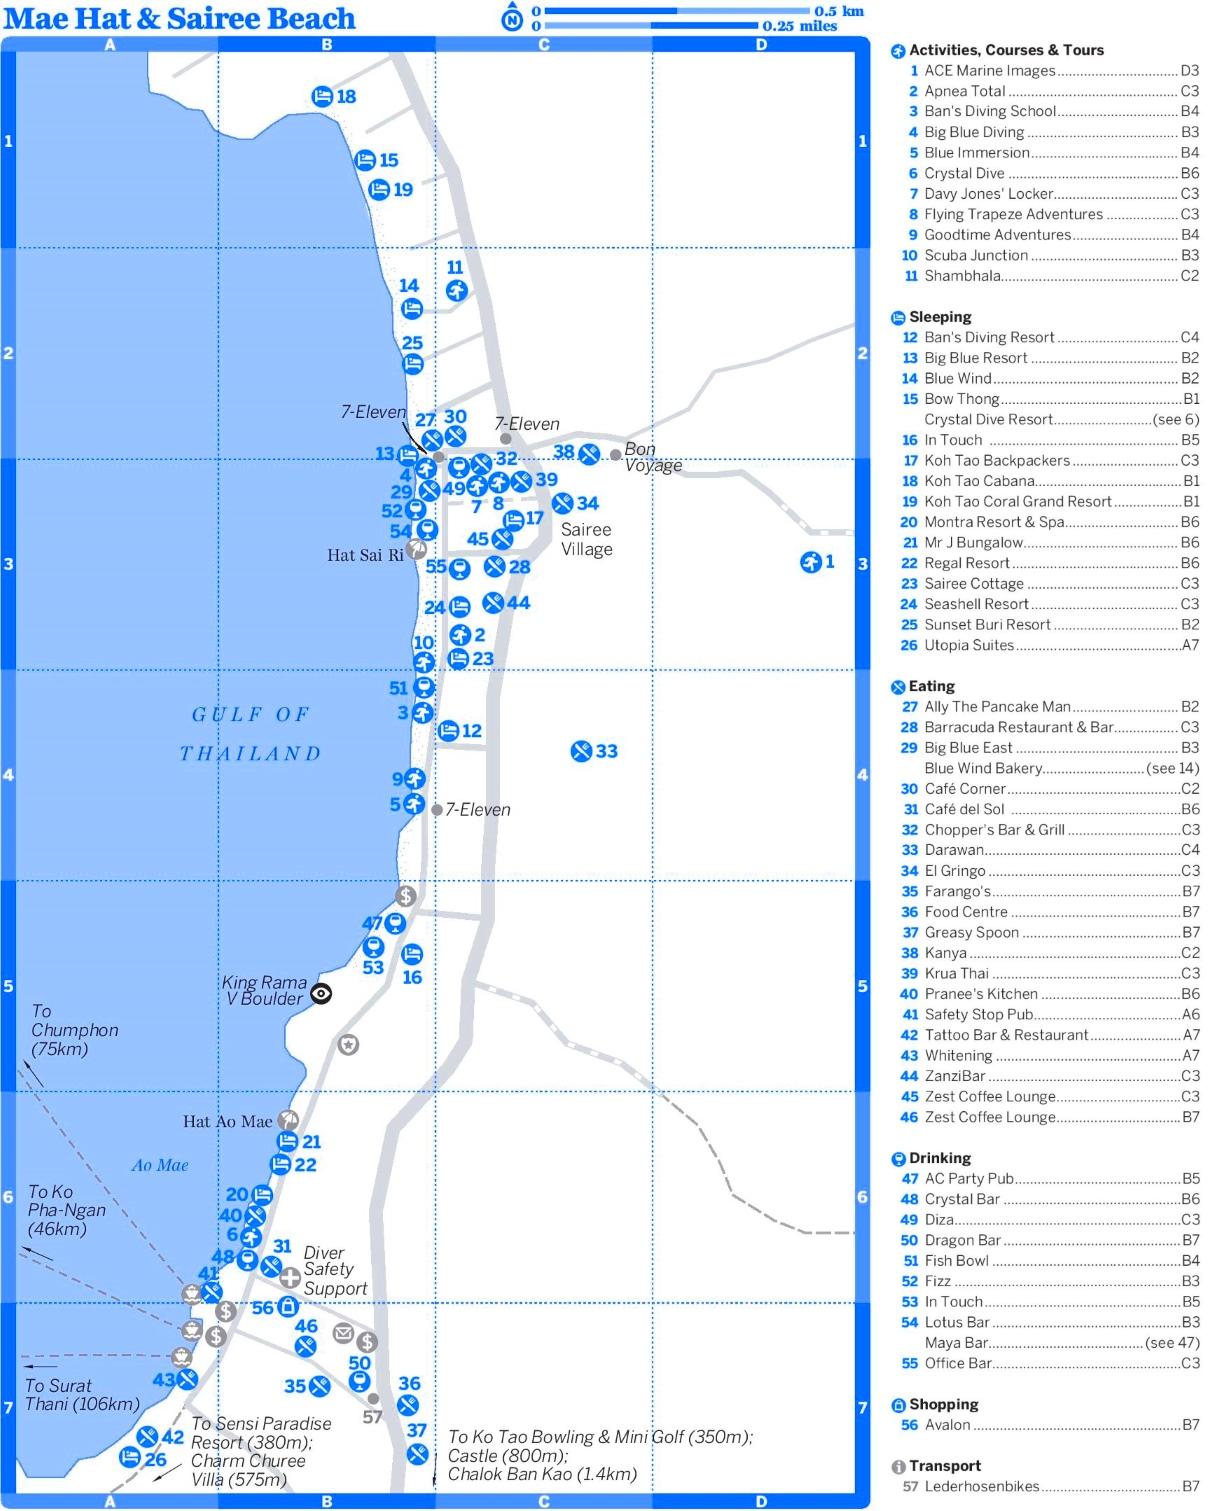 Mae Hat and Sairee Beach map